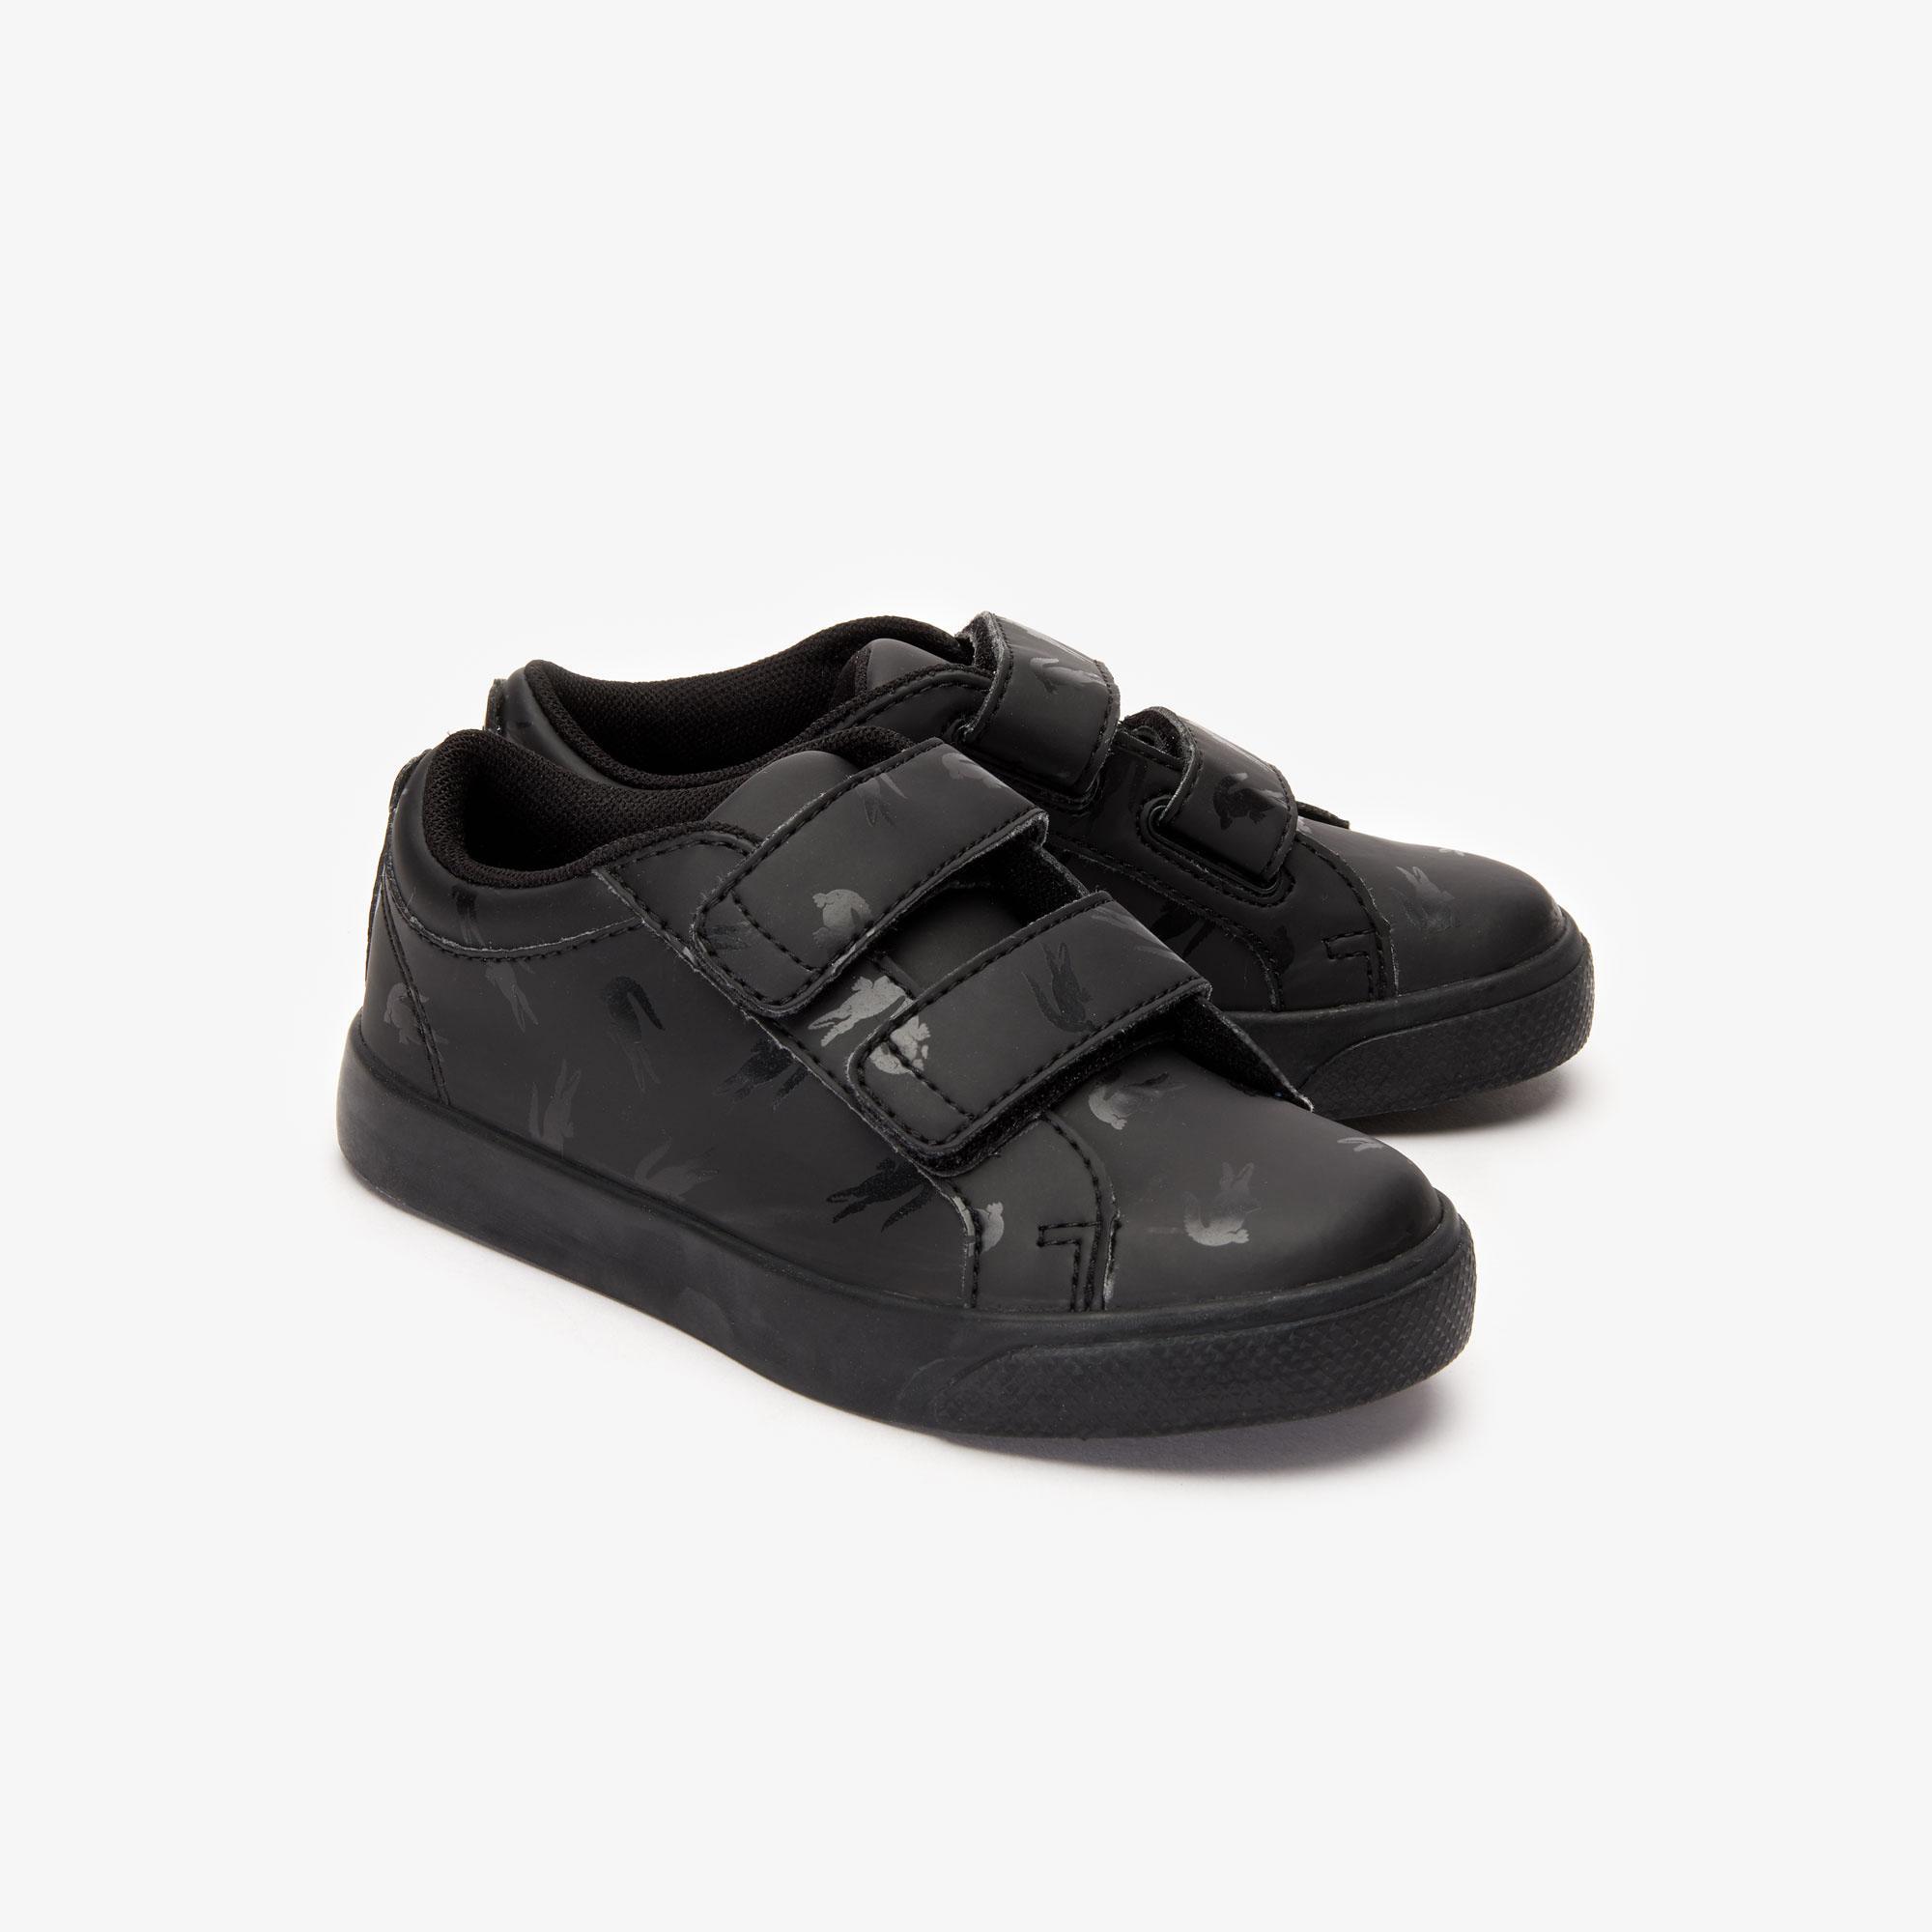 Lacoste Straightset 319 2 Cui Çocuk Siyah Casual Ayakkabı